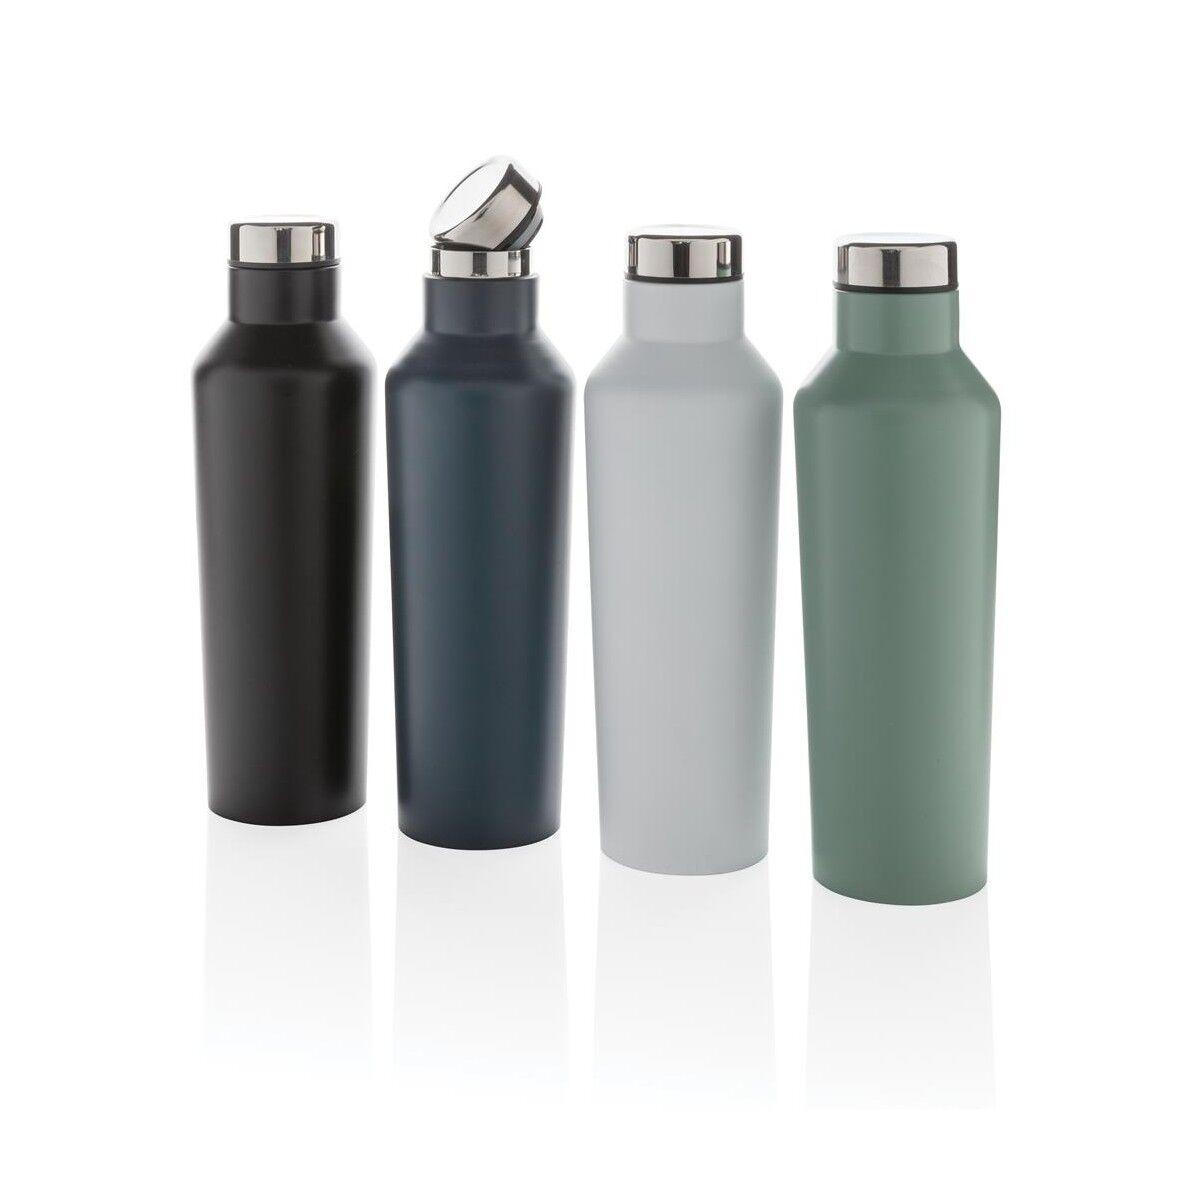 Auckland vacuum Stainless Steel Bottle